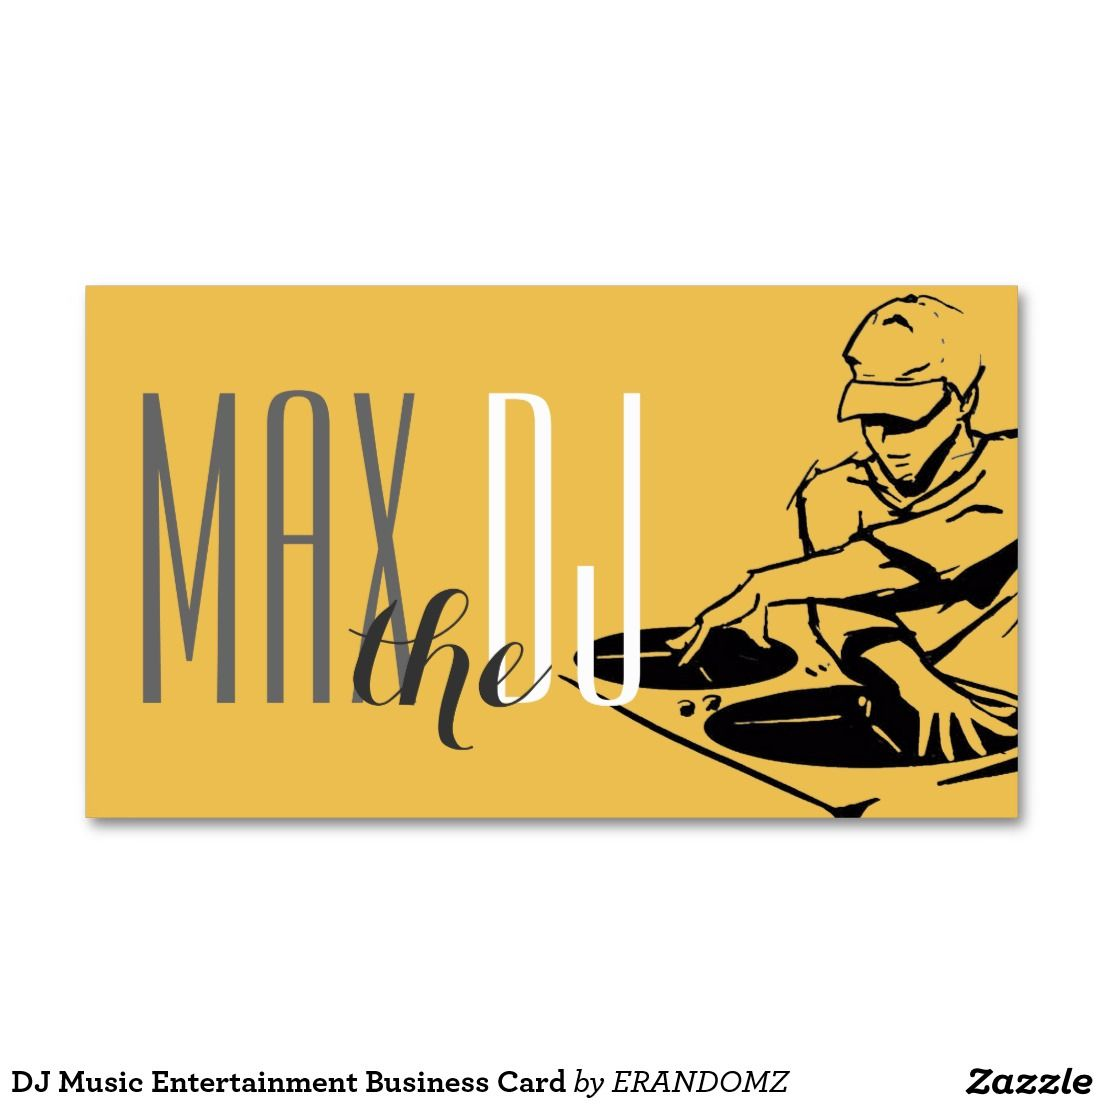 Dj music entertainment business card dj music business cards and dj dj music entertainment business card reheart Gallery